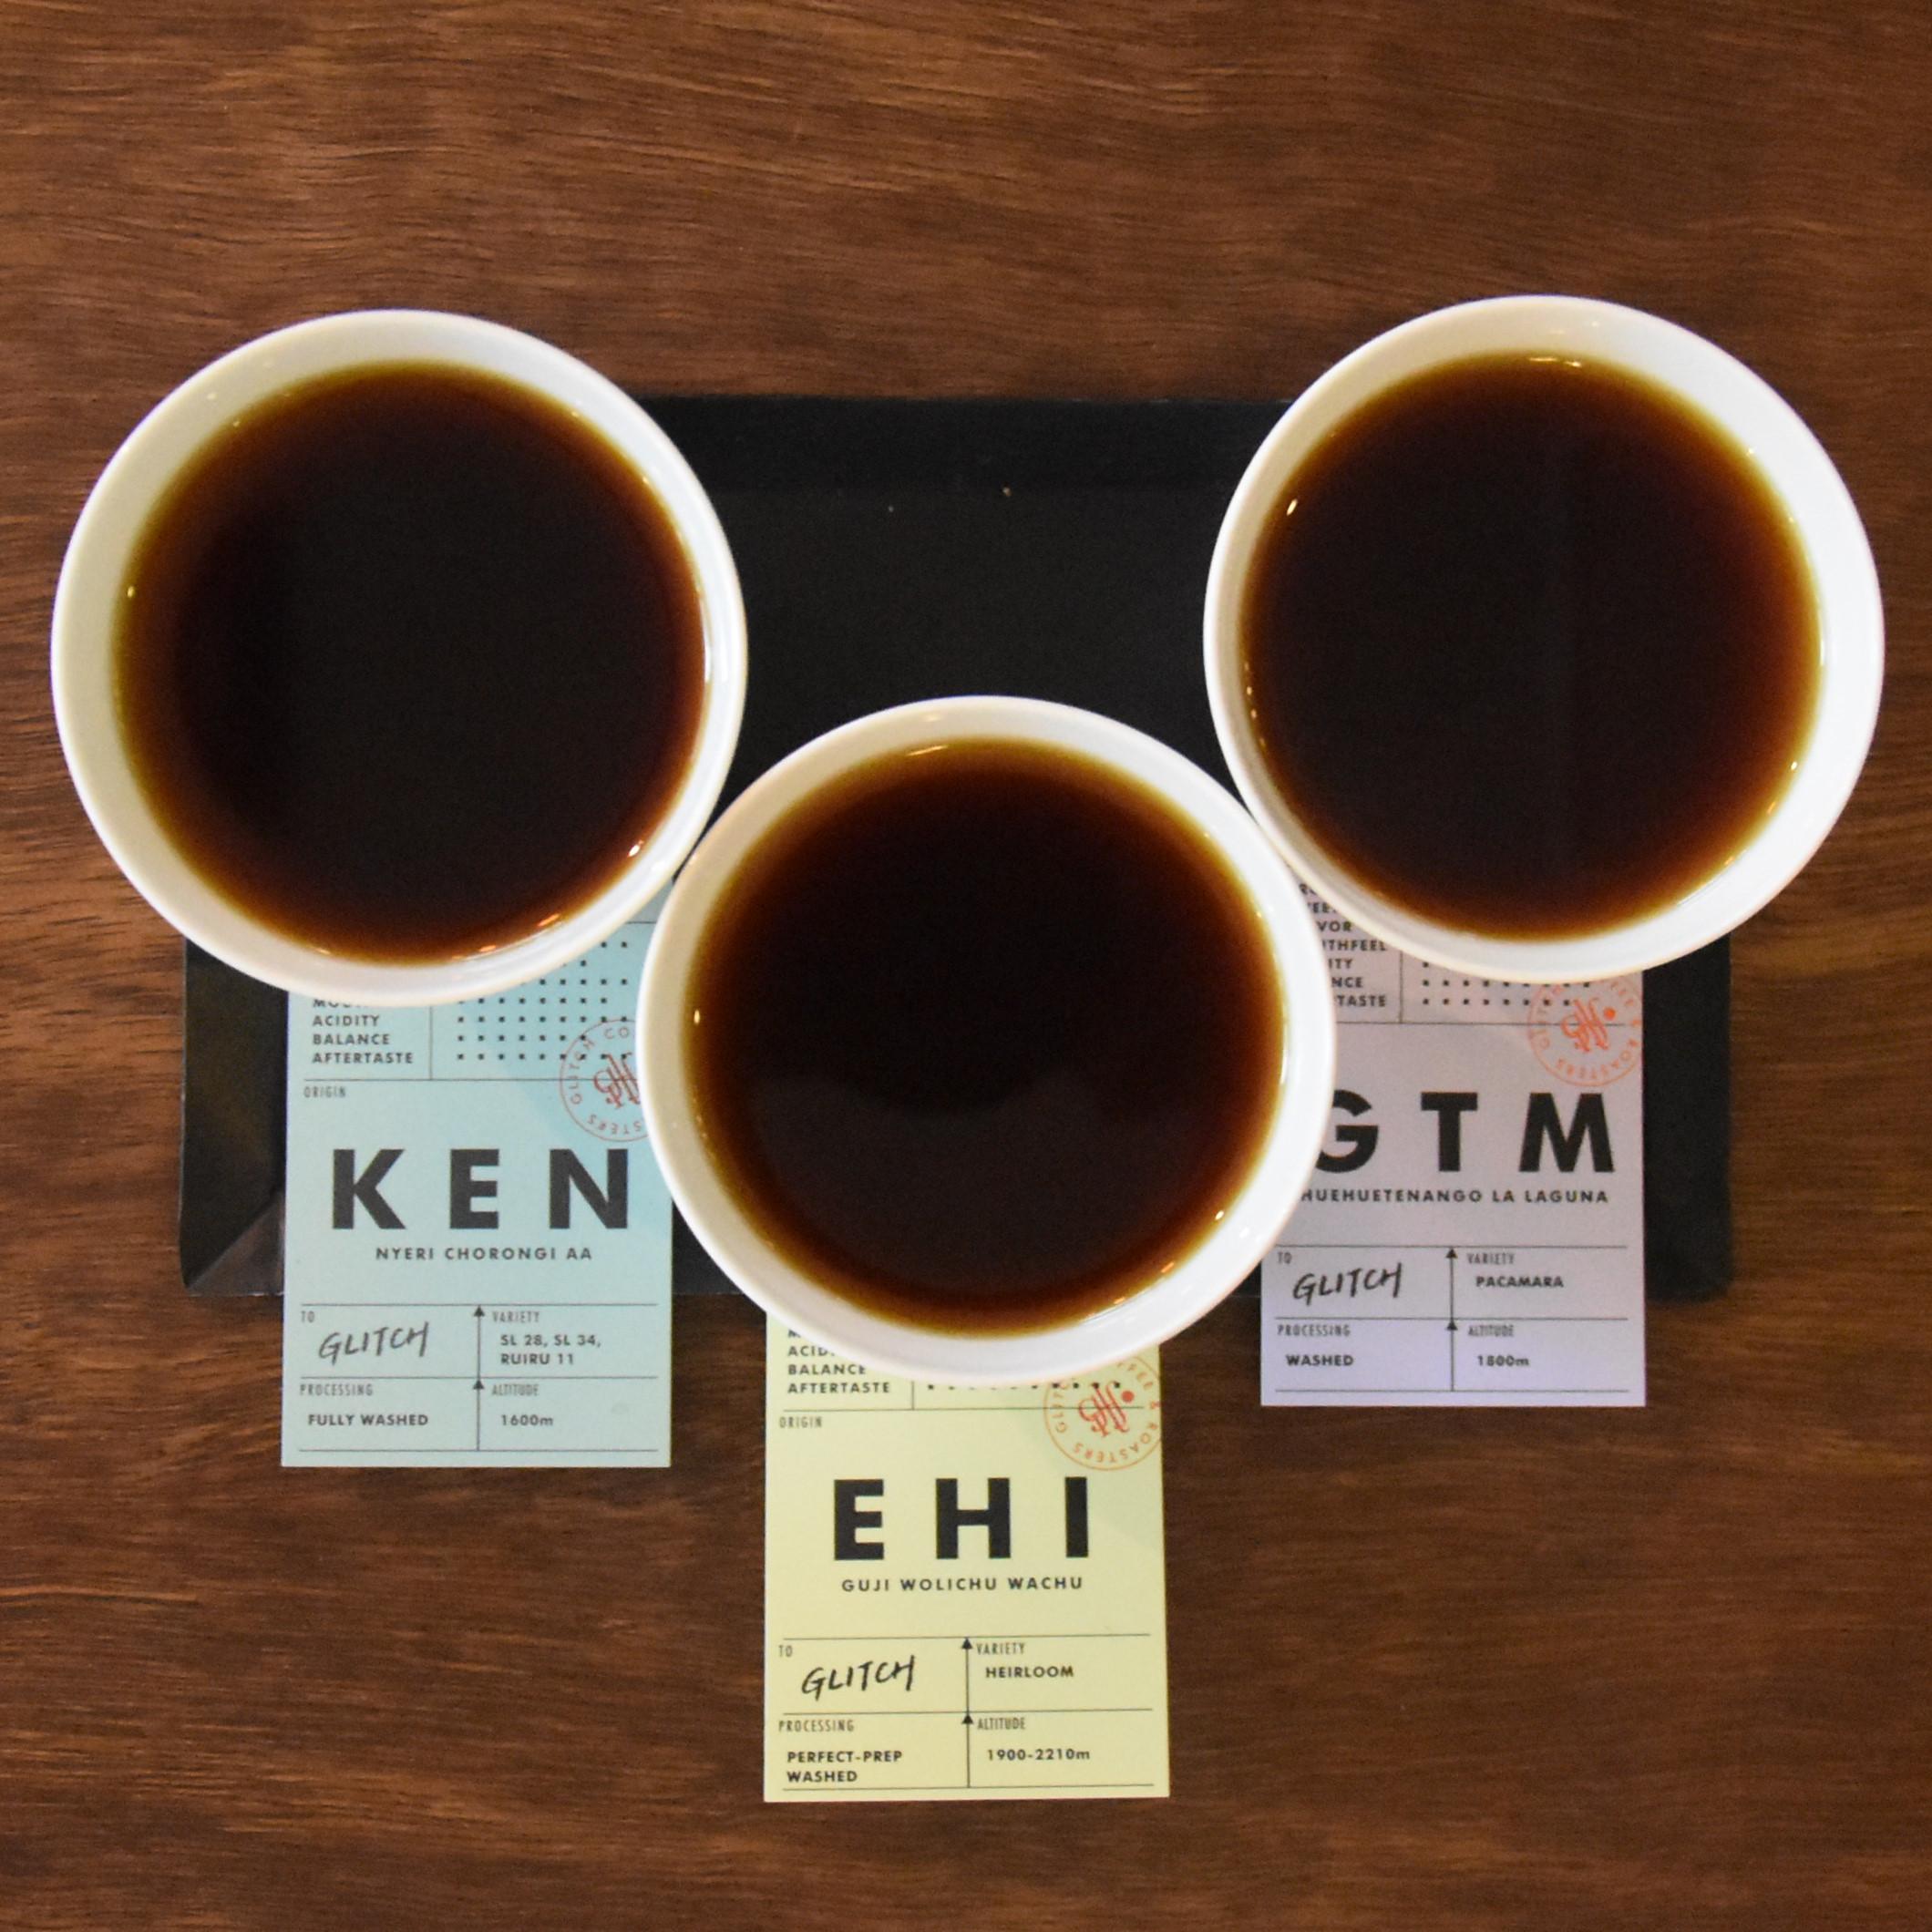 A tasting flight of three single-origin filters at Glitch Coffee & Roasters in Tokyo.